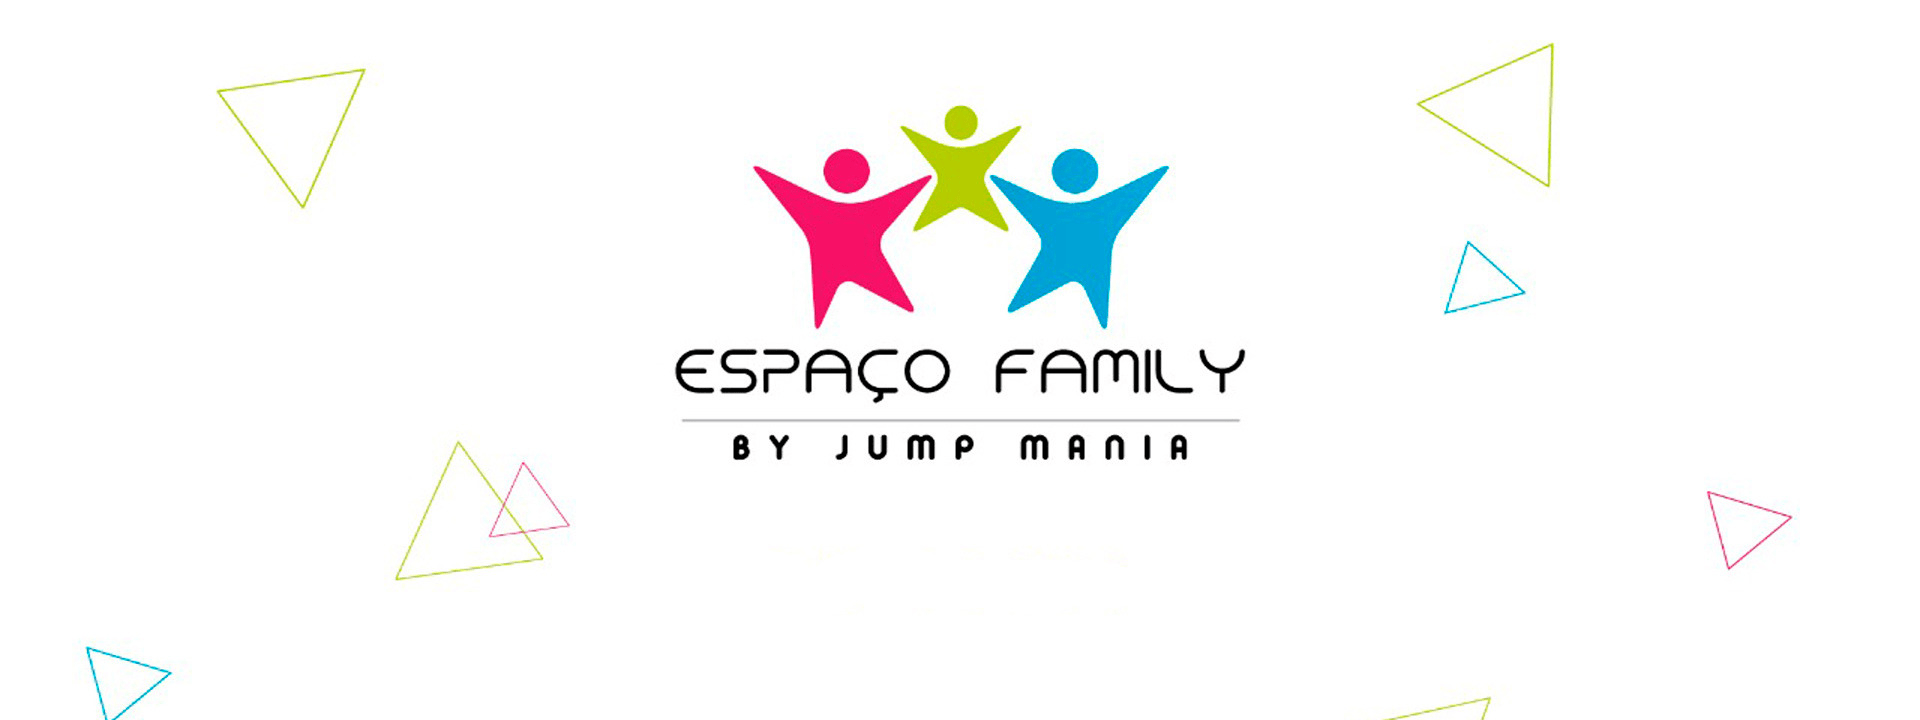 Espaço Family by Jump Mania | Galleria Shopping